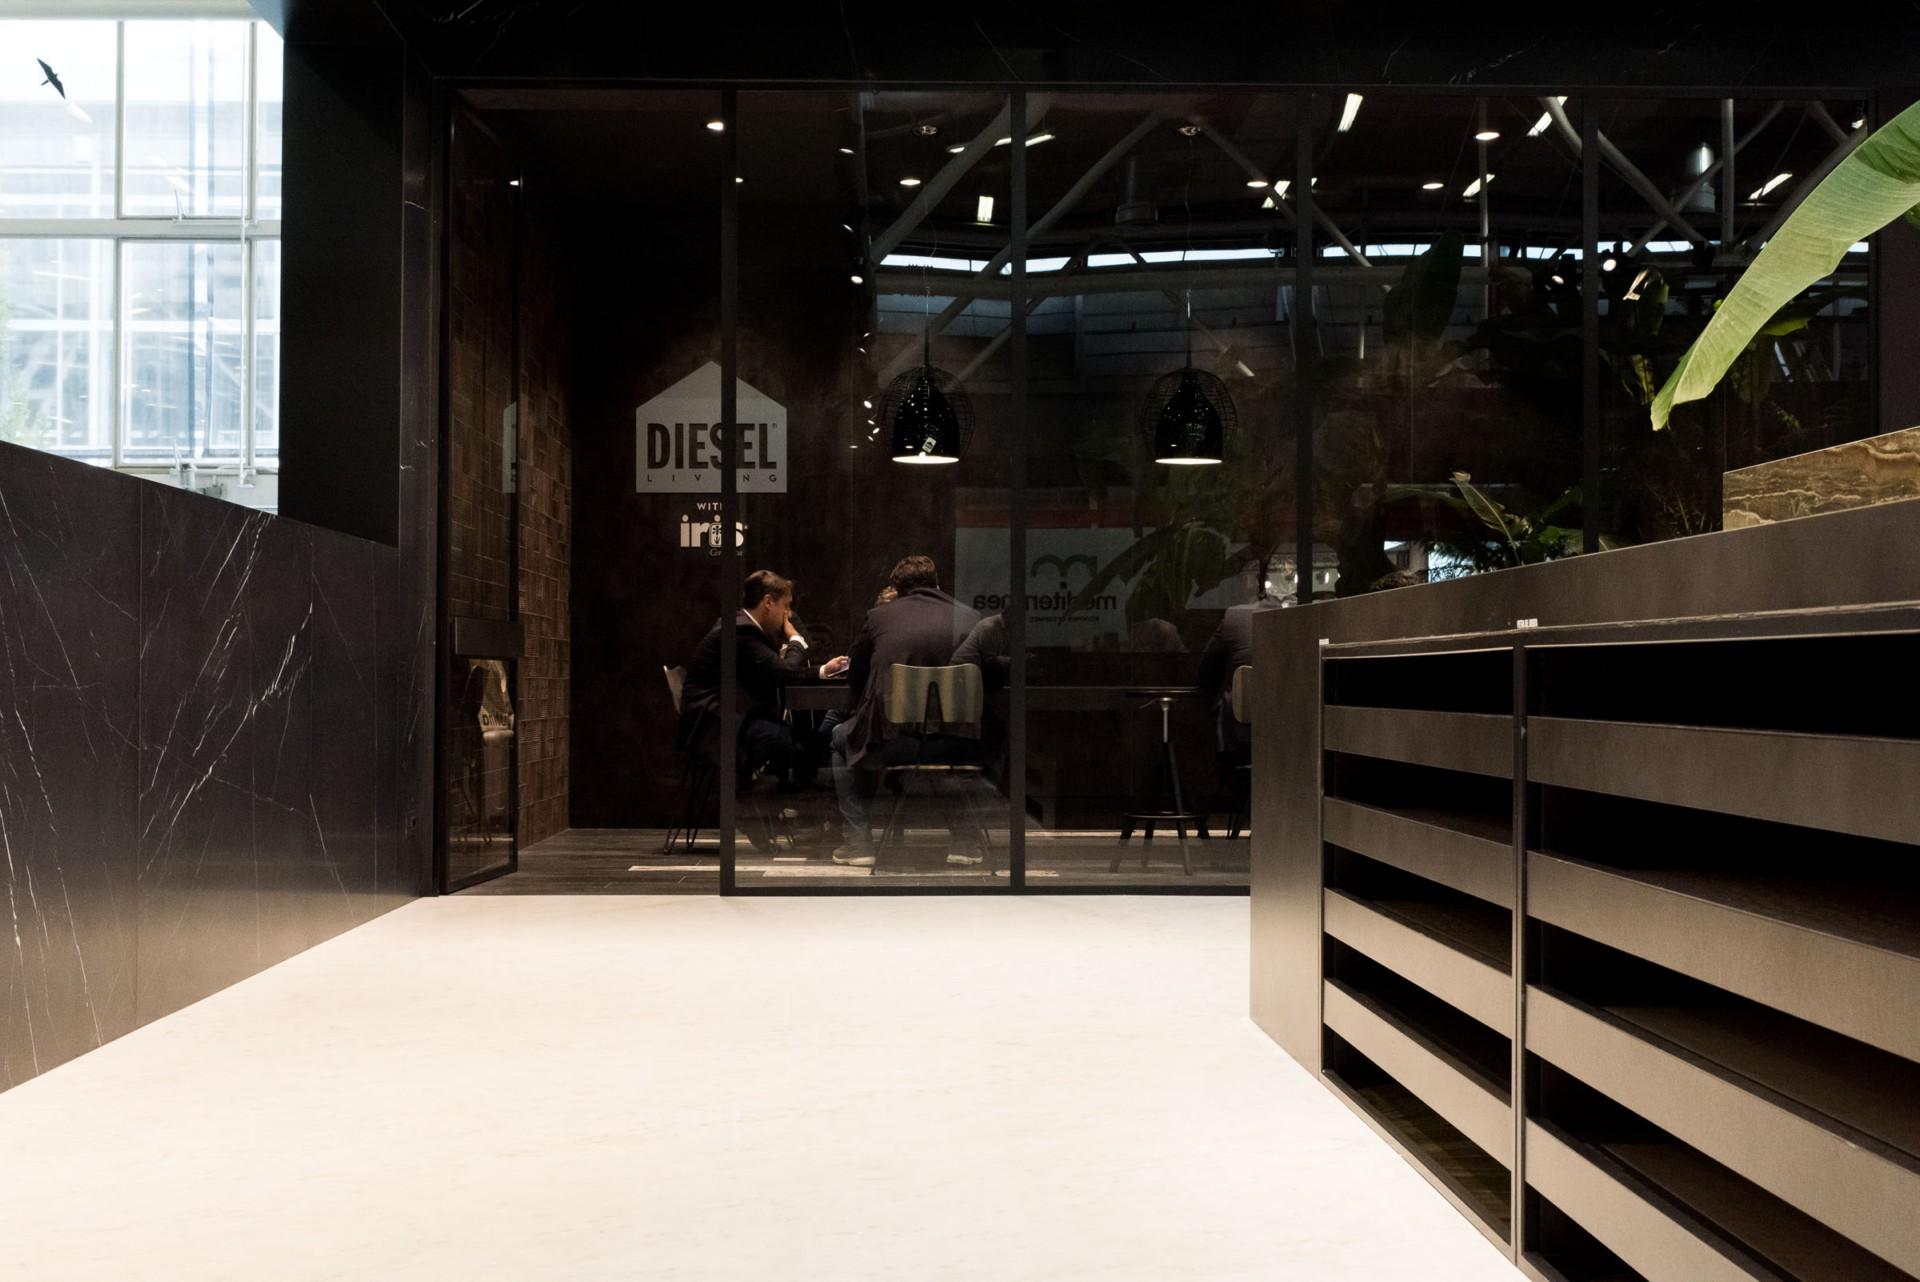 Iris ceramica - FMG Fabbrica Marmi e Graniti - Eiffelgres en Cersaie 2017